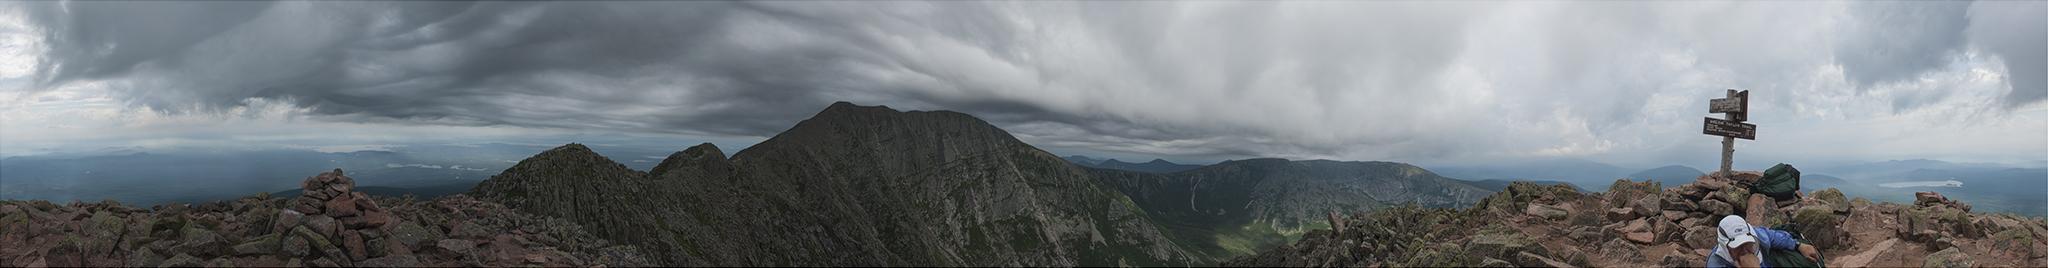 Mt Katahdin from Pamola Peak